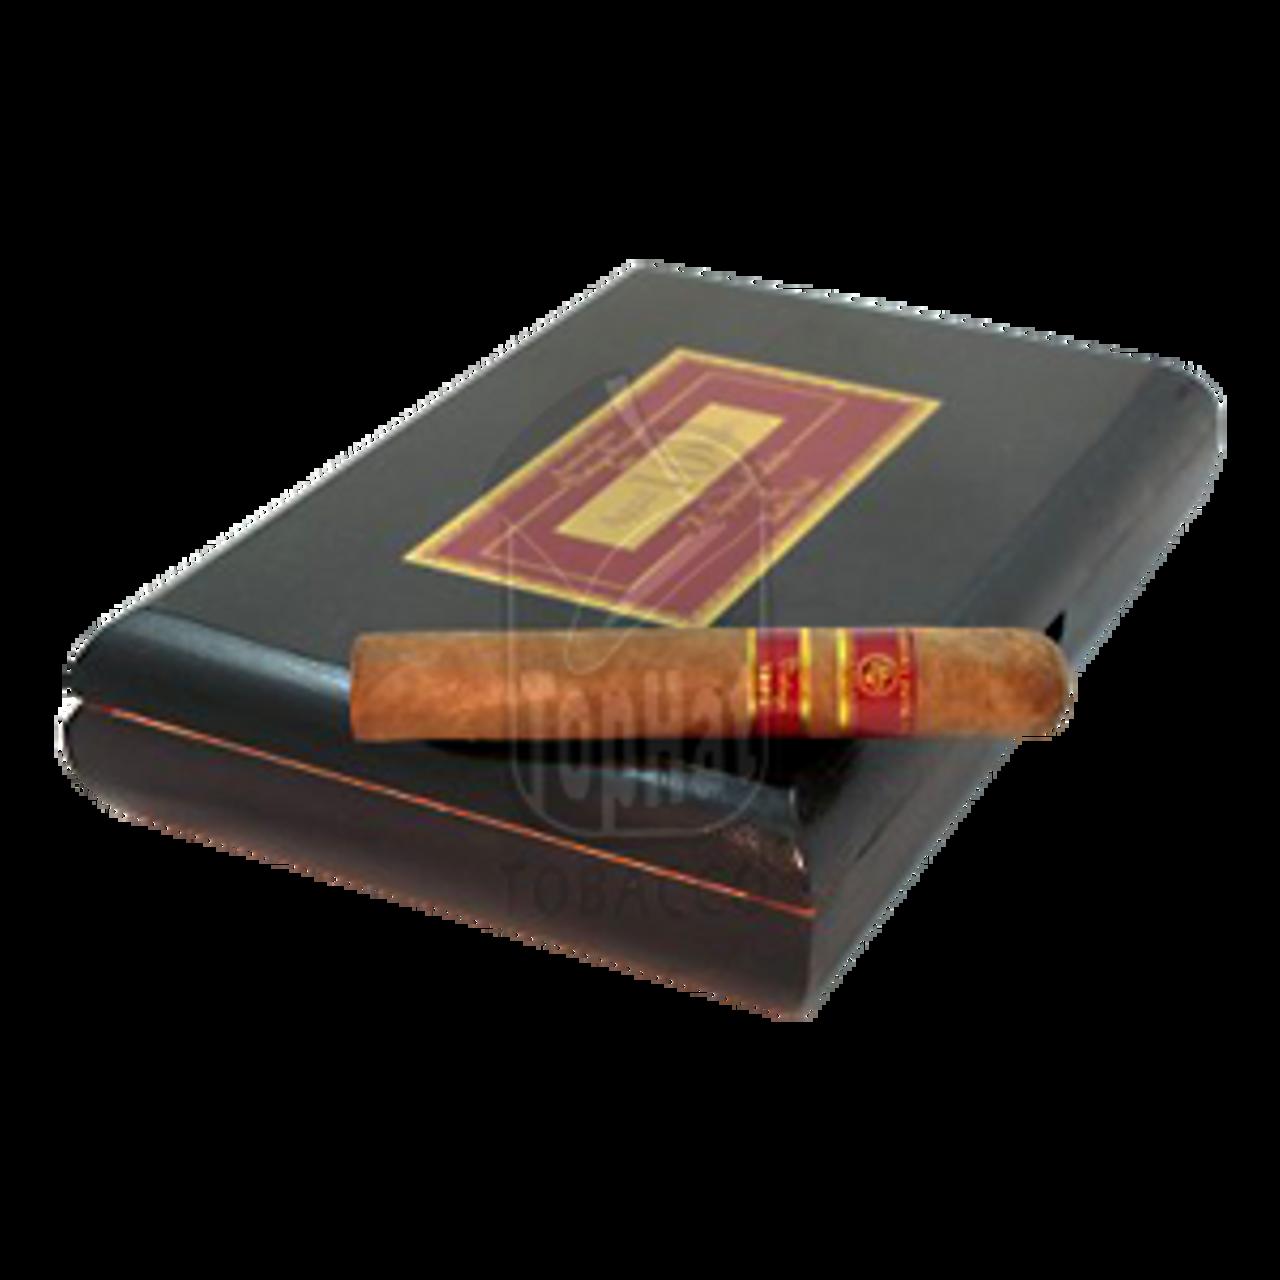 Rocky Patel Vintage 1992 Sixty Cigars - 6 x 60 (Box of 20)